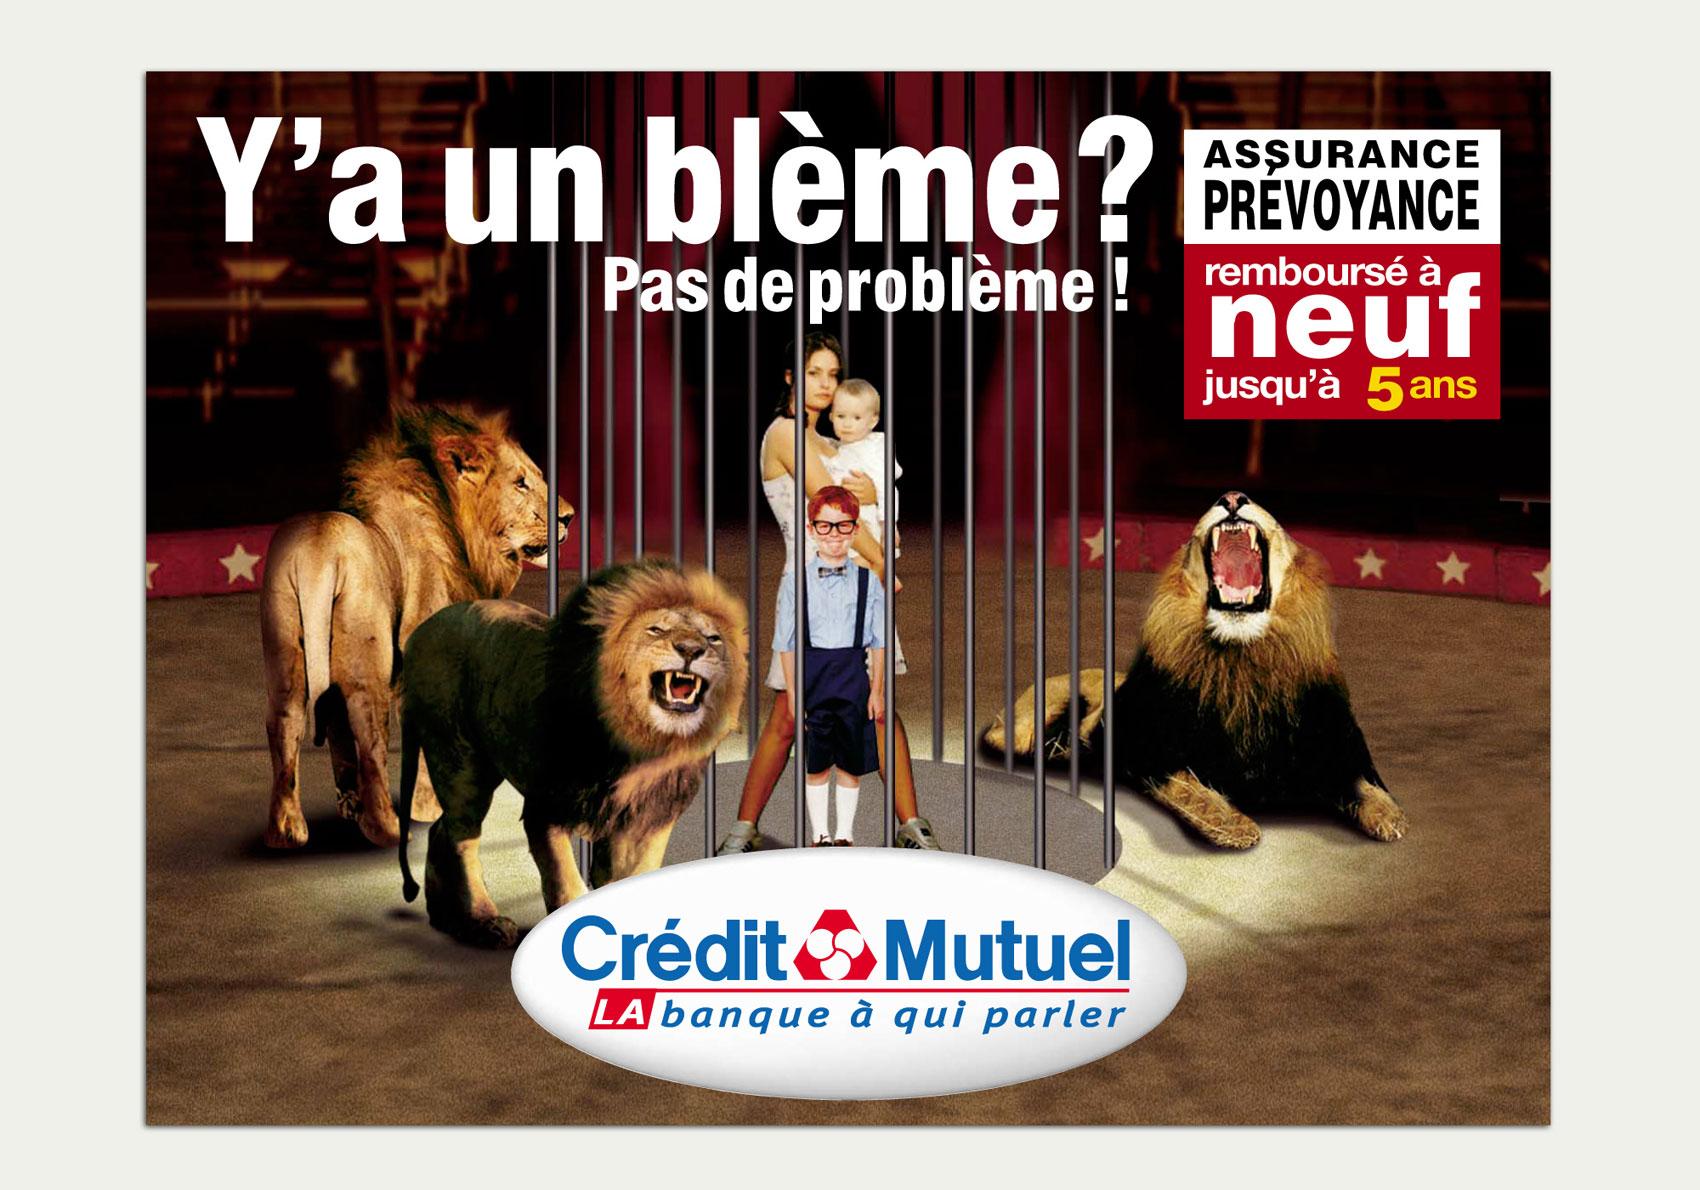 bancassurance-credit-mutuel-2002-3